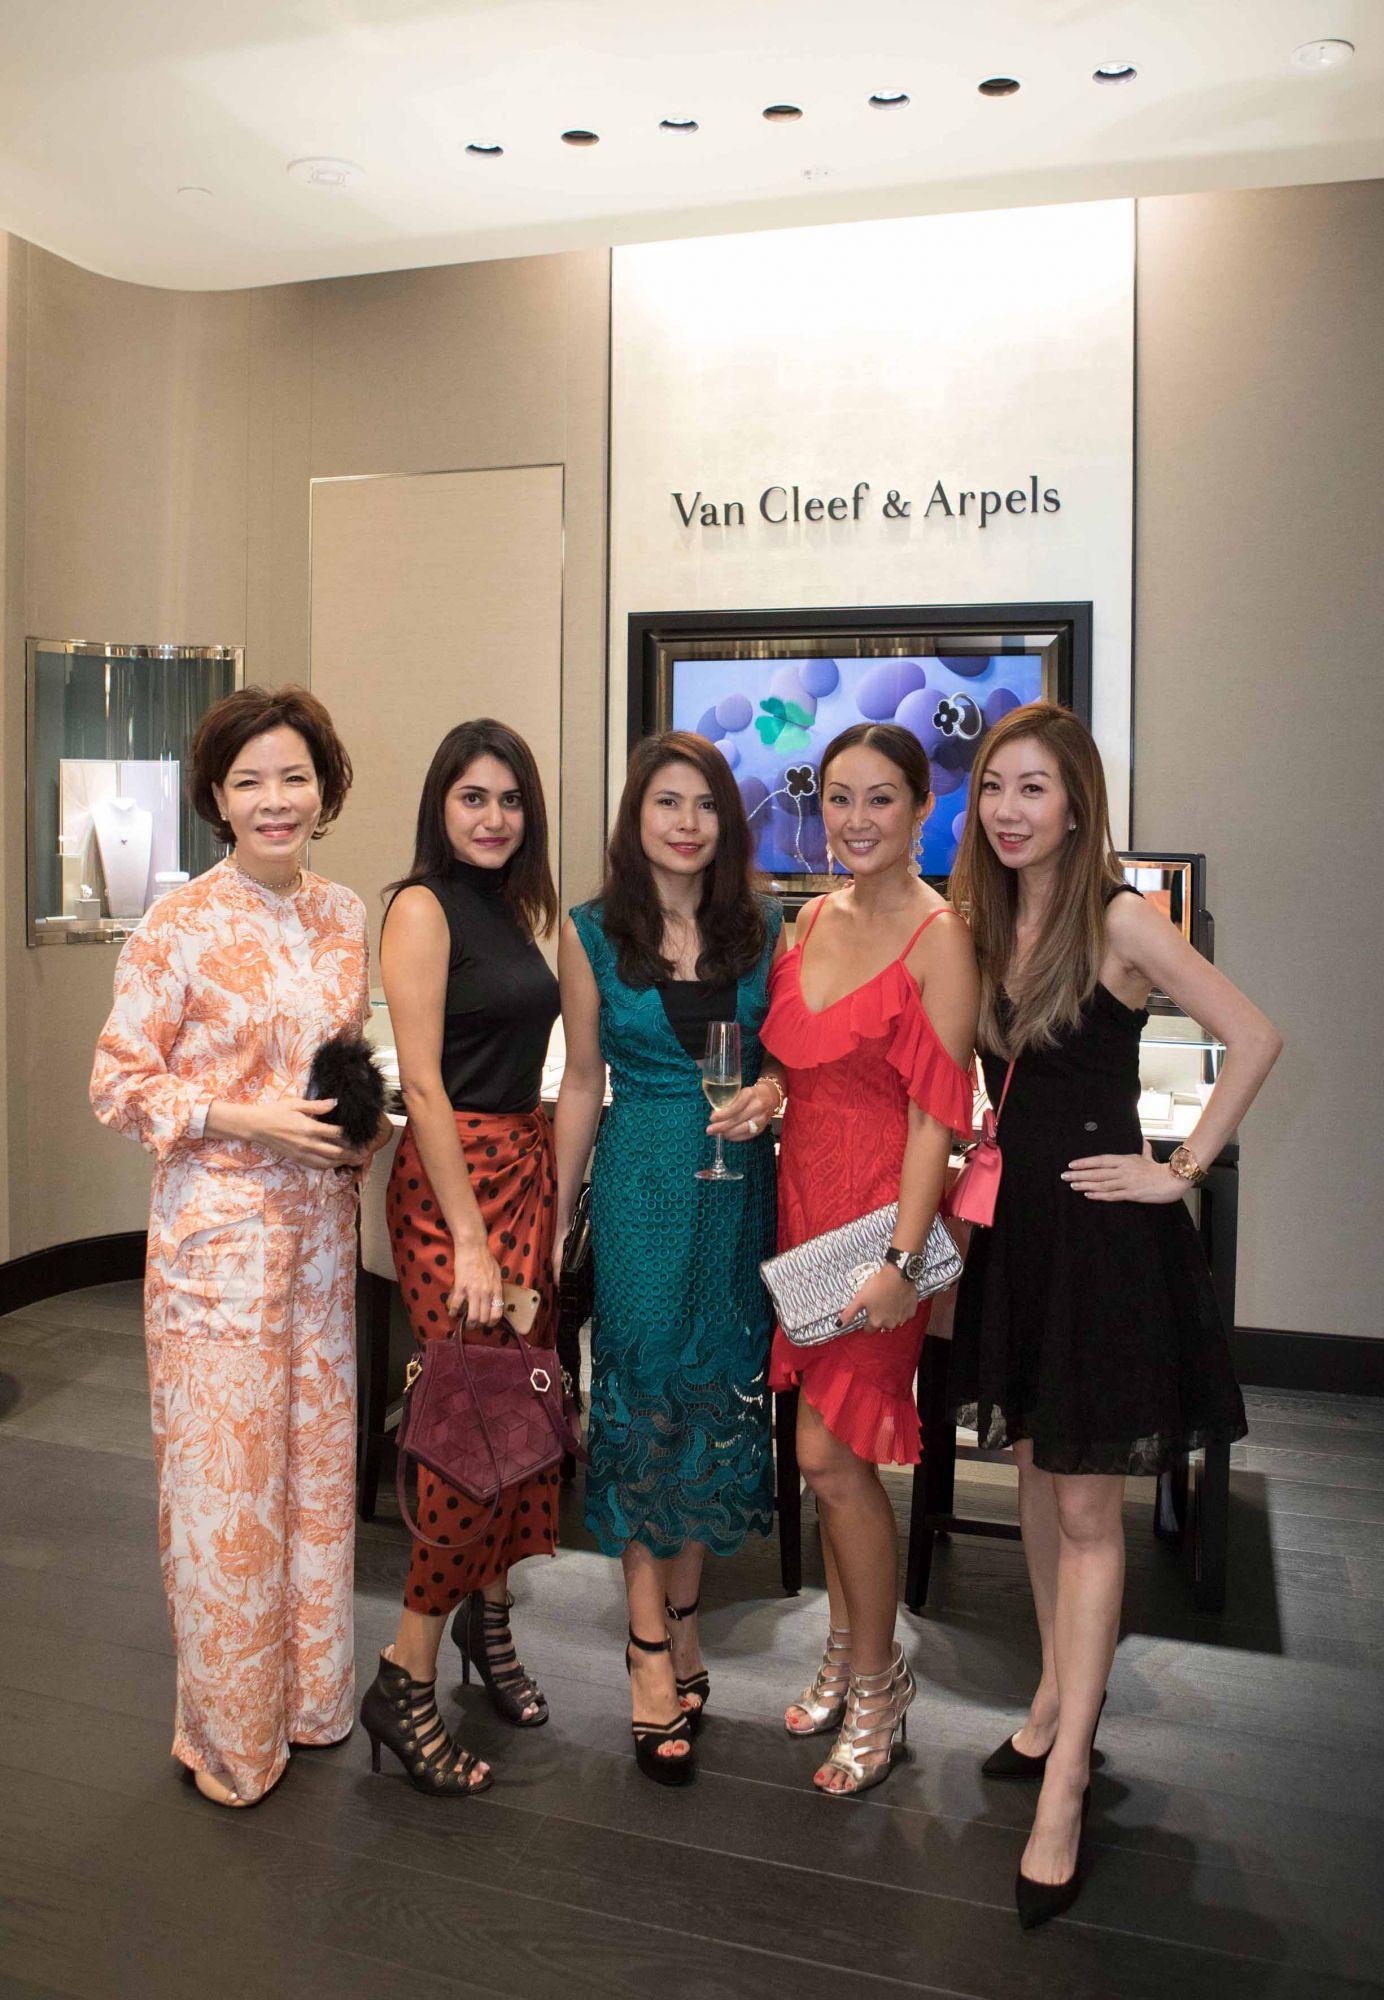 Grace Wong, Karishma Tulsidas, Marilyn Lum, Serene Chua, Alicia Loke